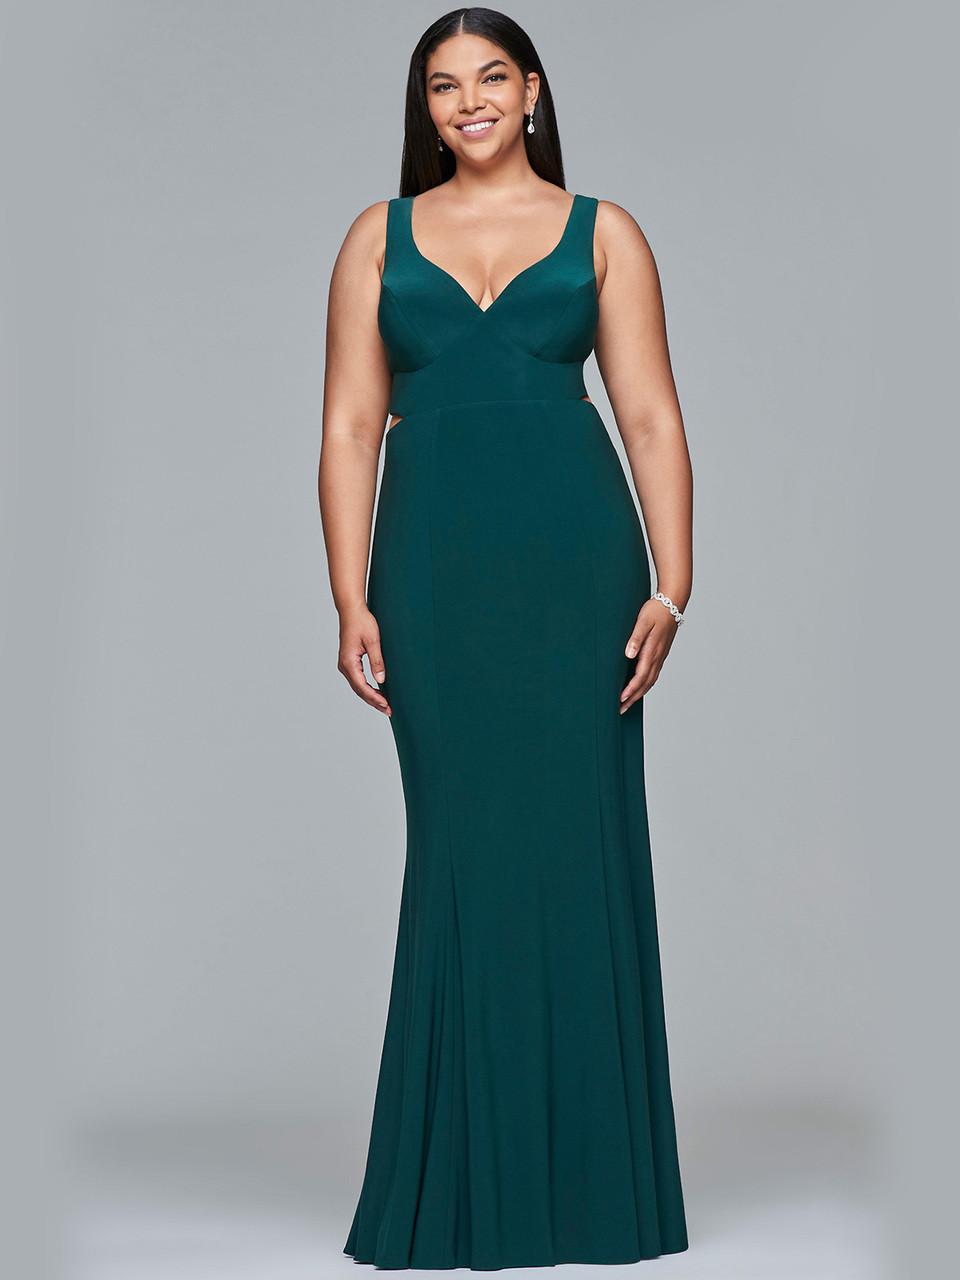 5b9b7389380 V-neck Fitted Jersey Faviana Curves Dress 9429